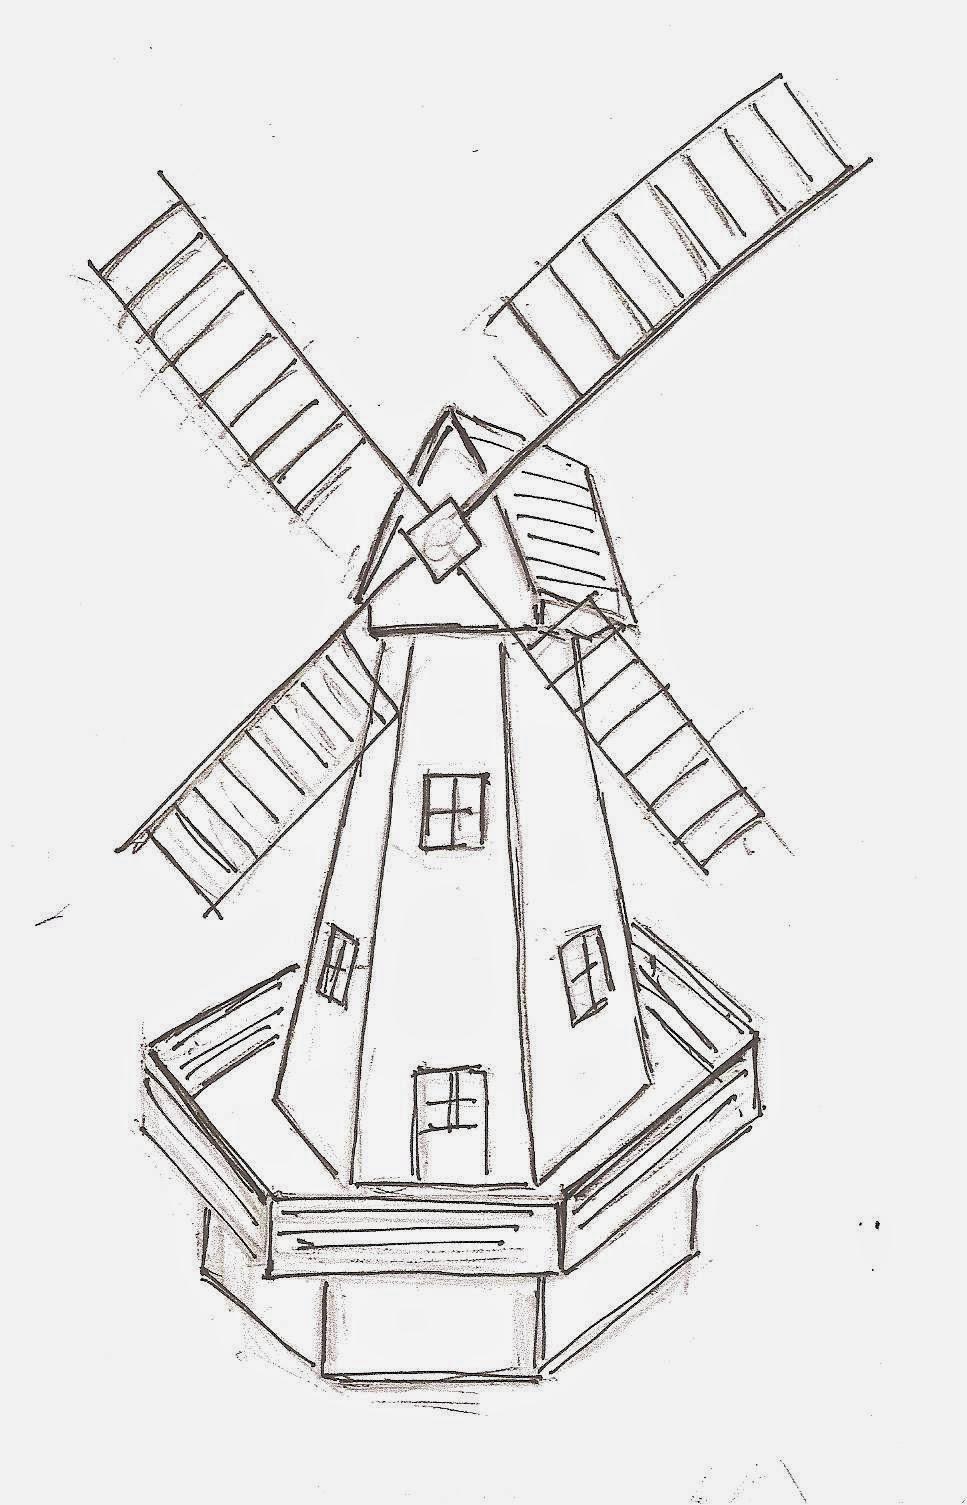 Les Bricodossiers De Papy: Un Moulin De Jardin concernant Construire Un Moulin A Vent De Jardin